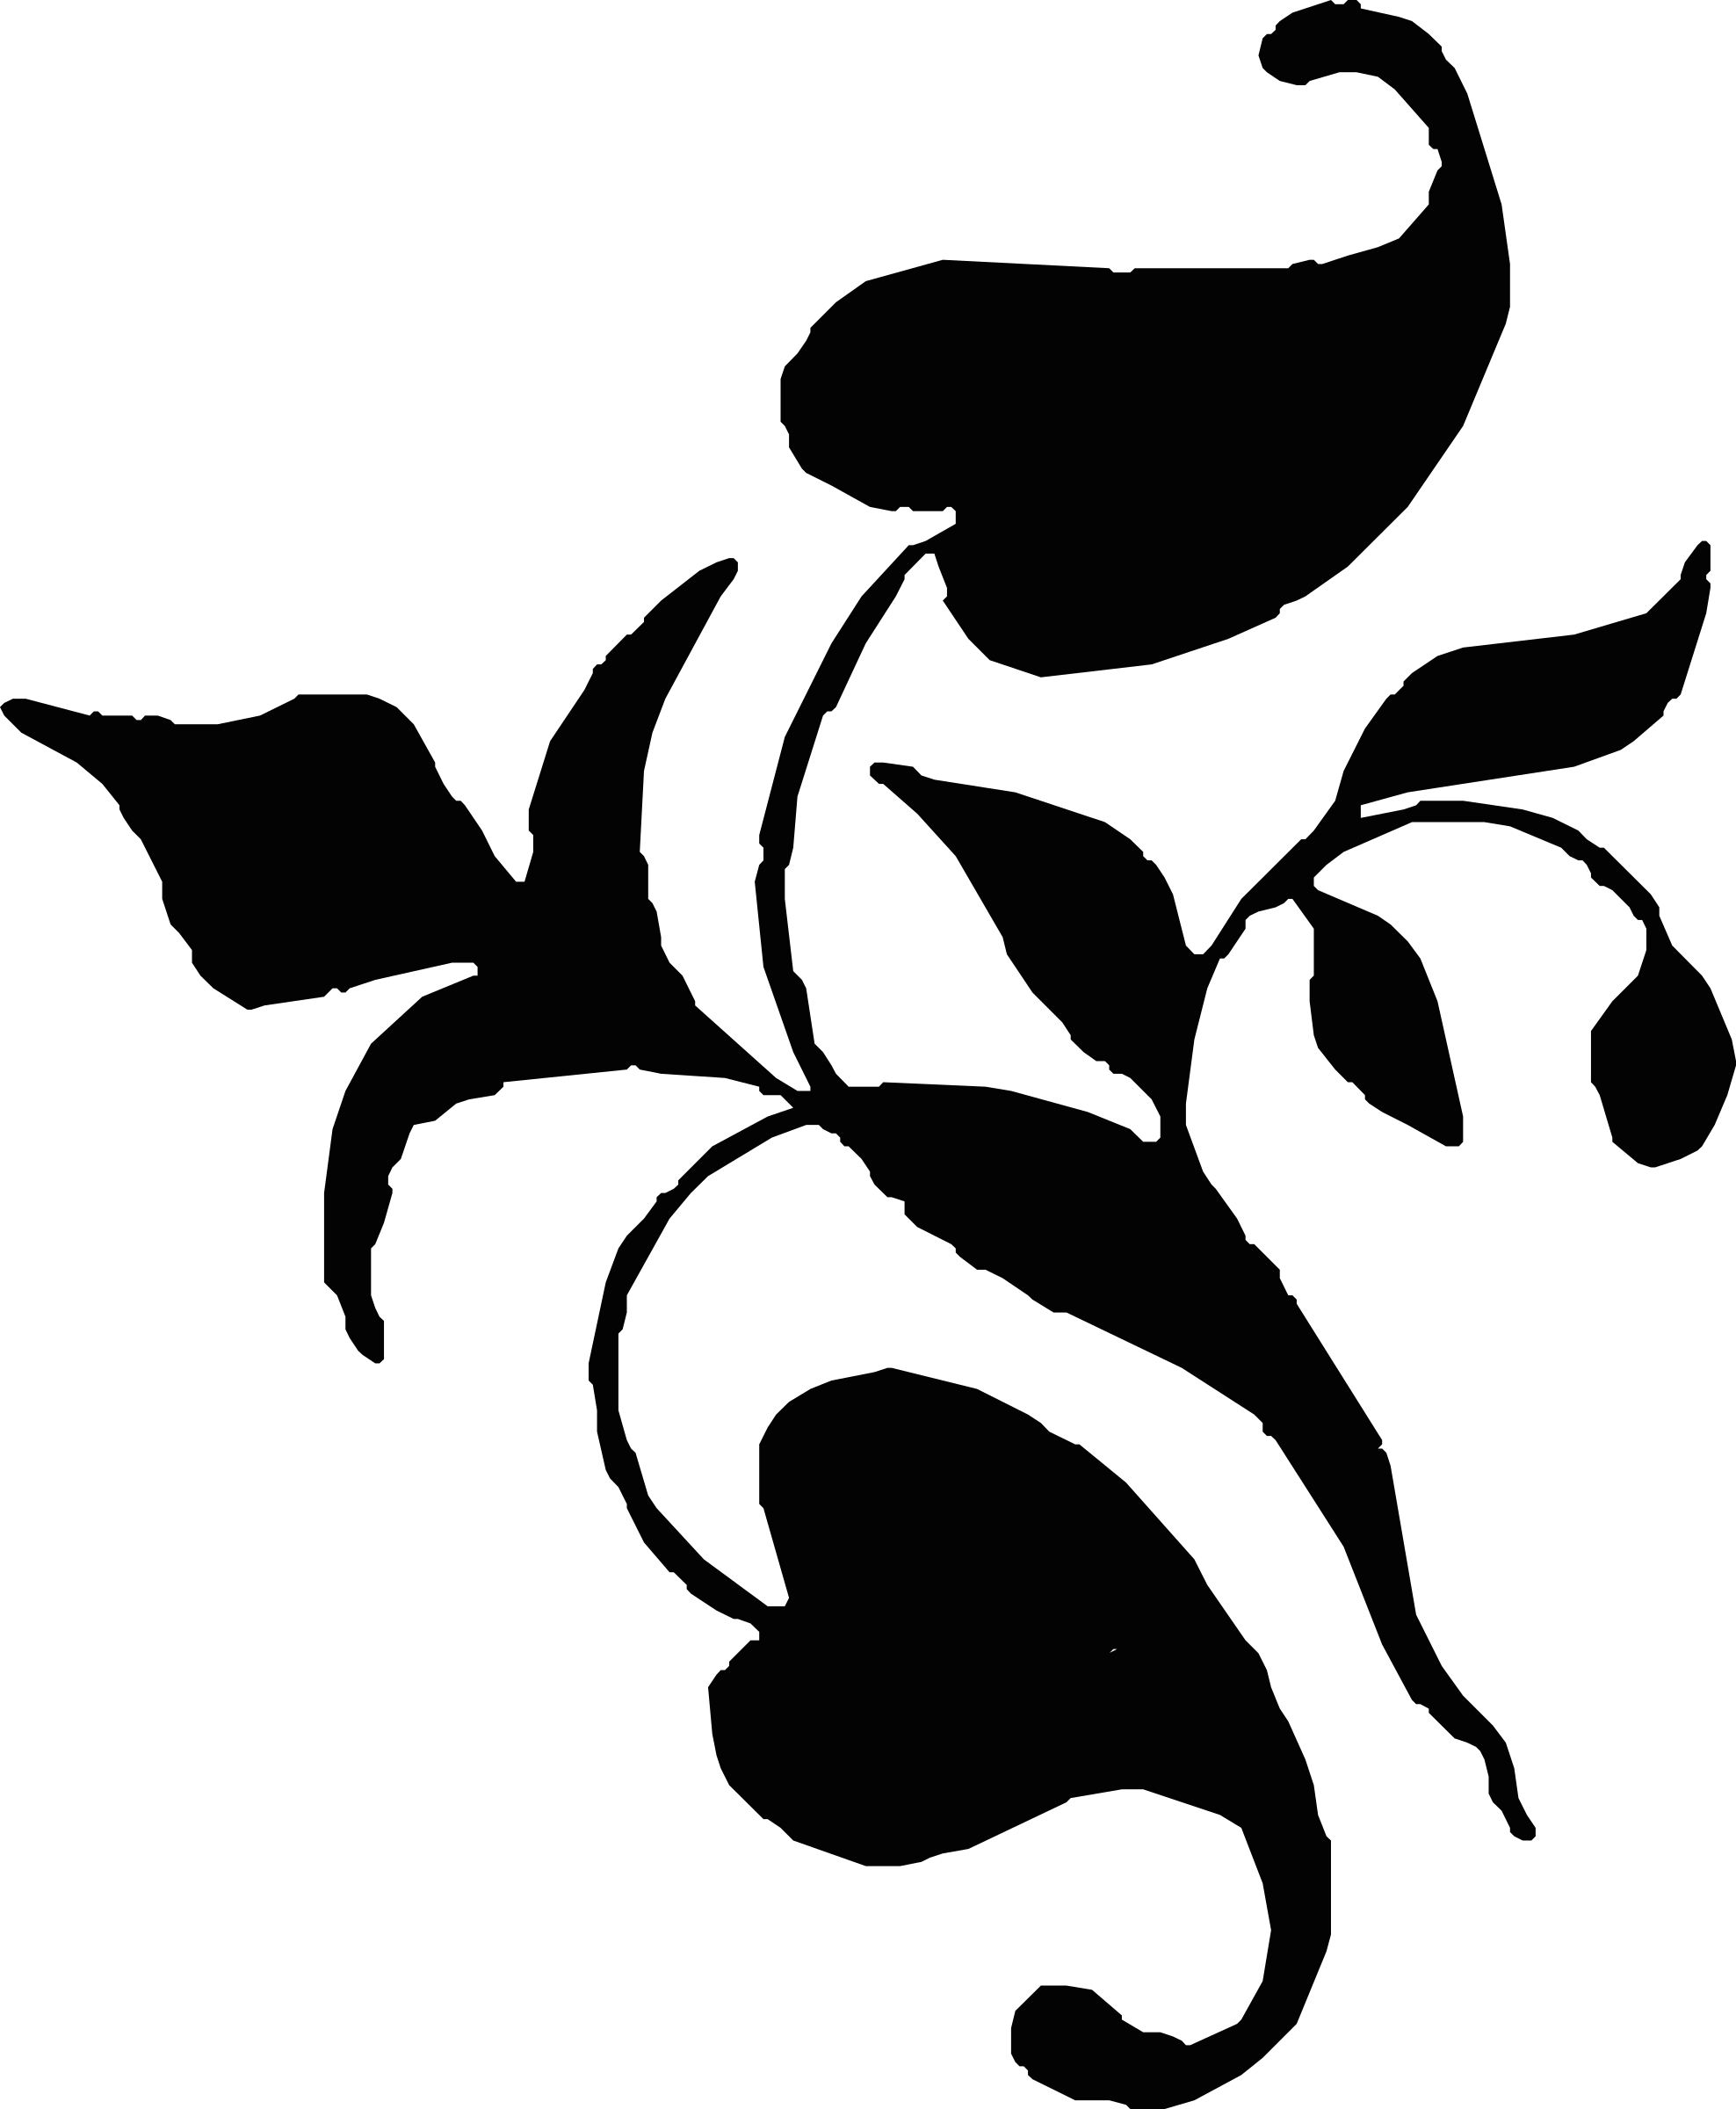 Vines clipart flowering vine. Ornamental leaves big image